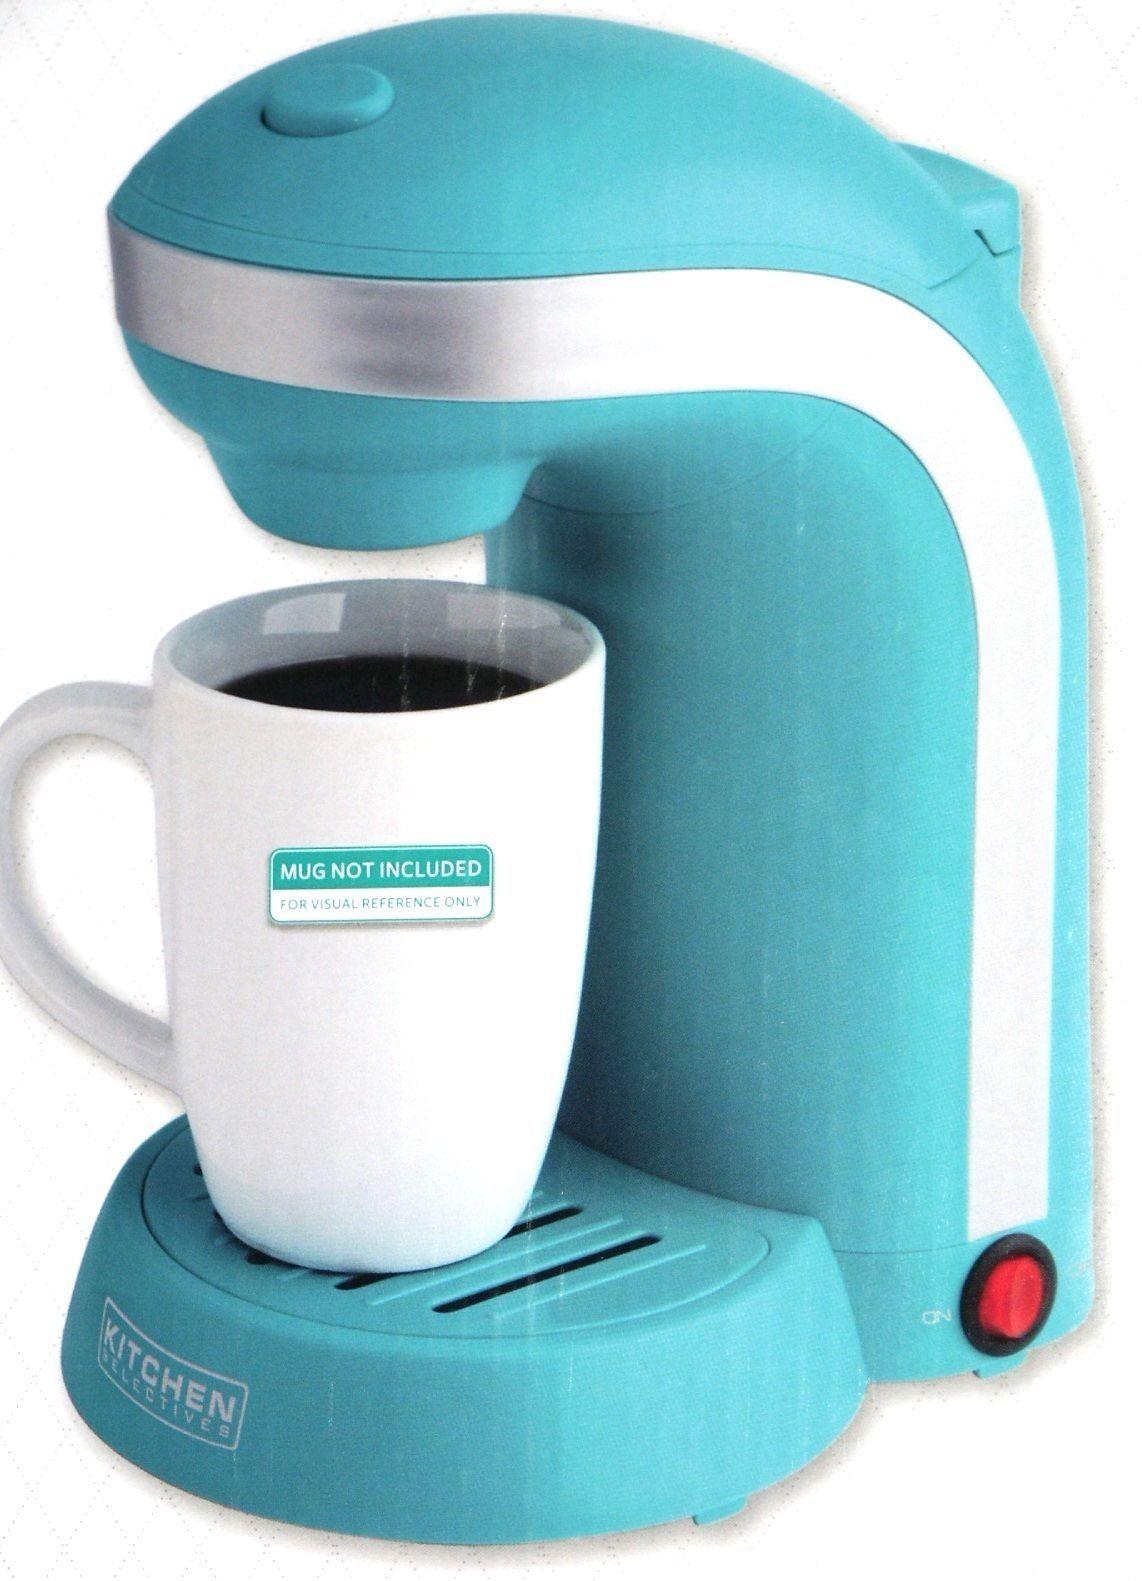 New Kitchen Selectives Colors Single Serve Coffee Maker Teal Blue (mug not incl) - Single Serve ...